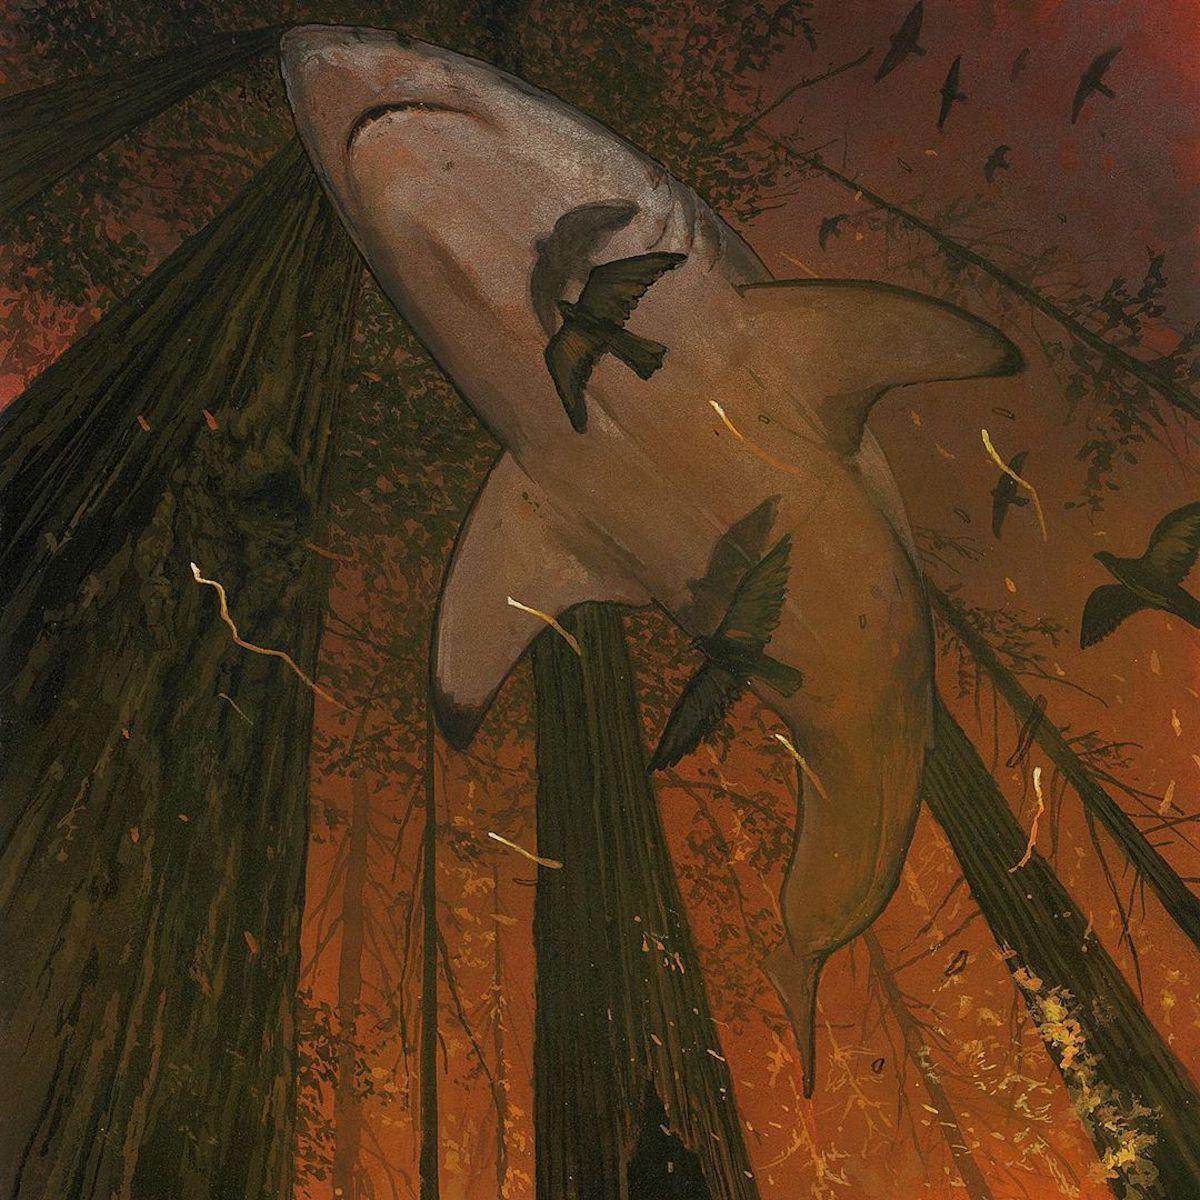 pinturas de tiburones